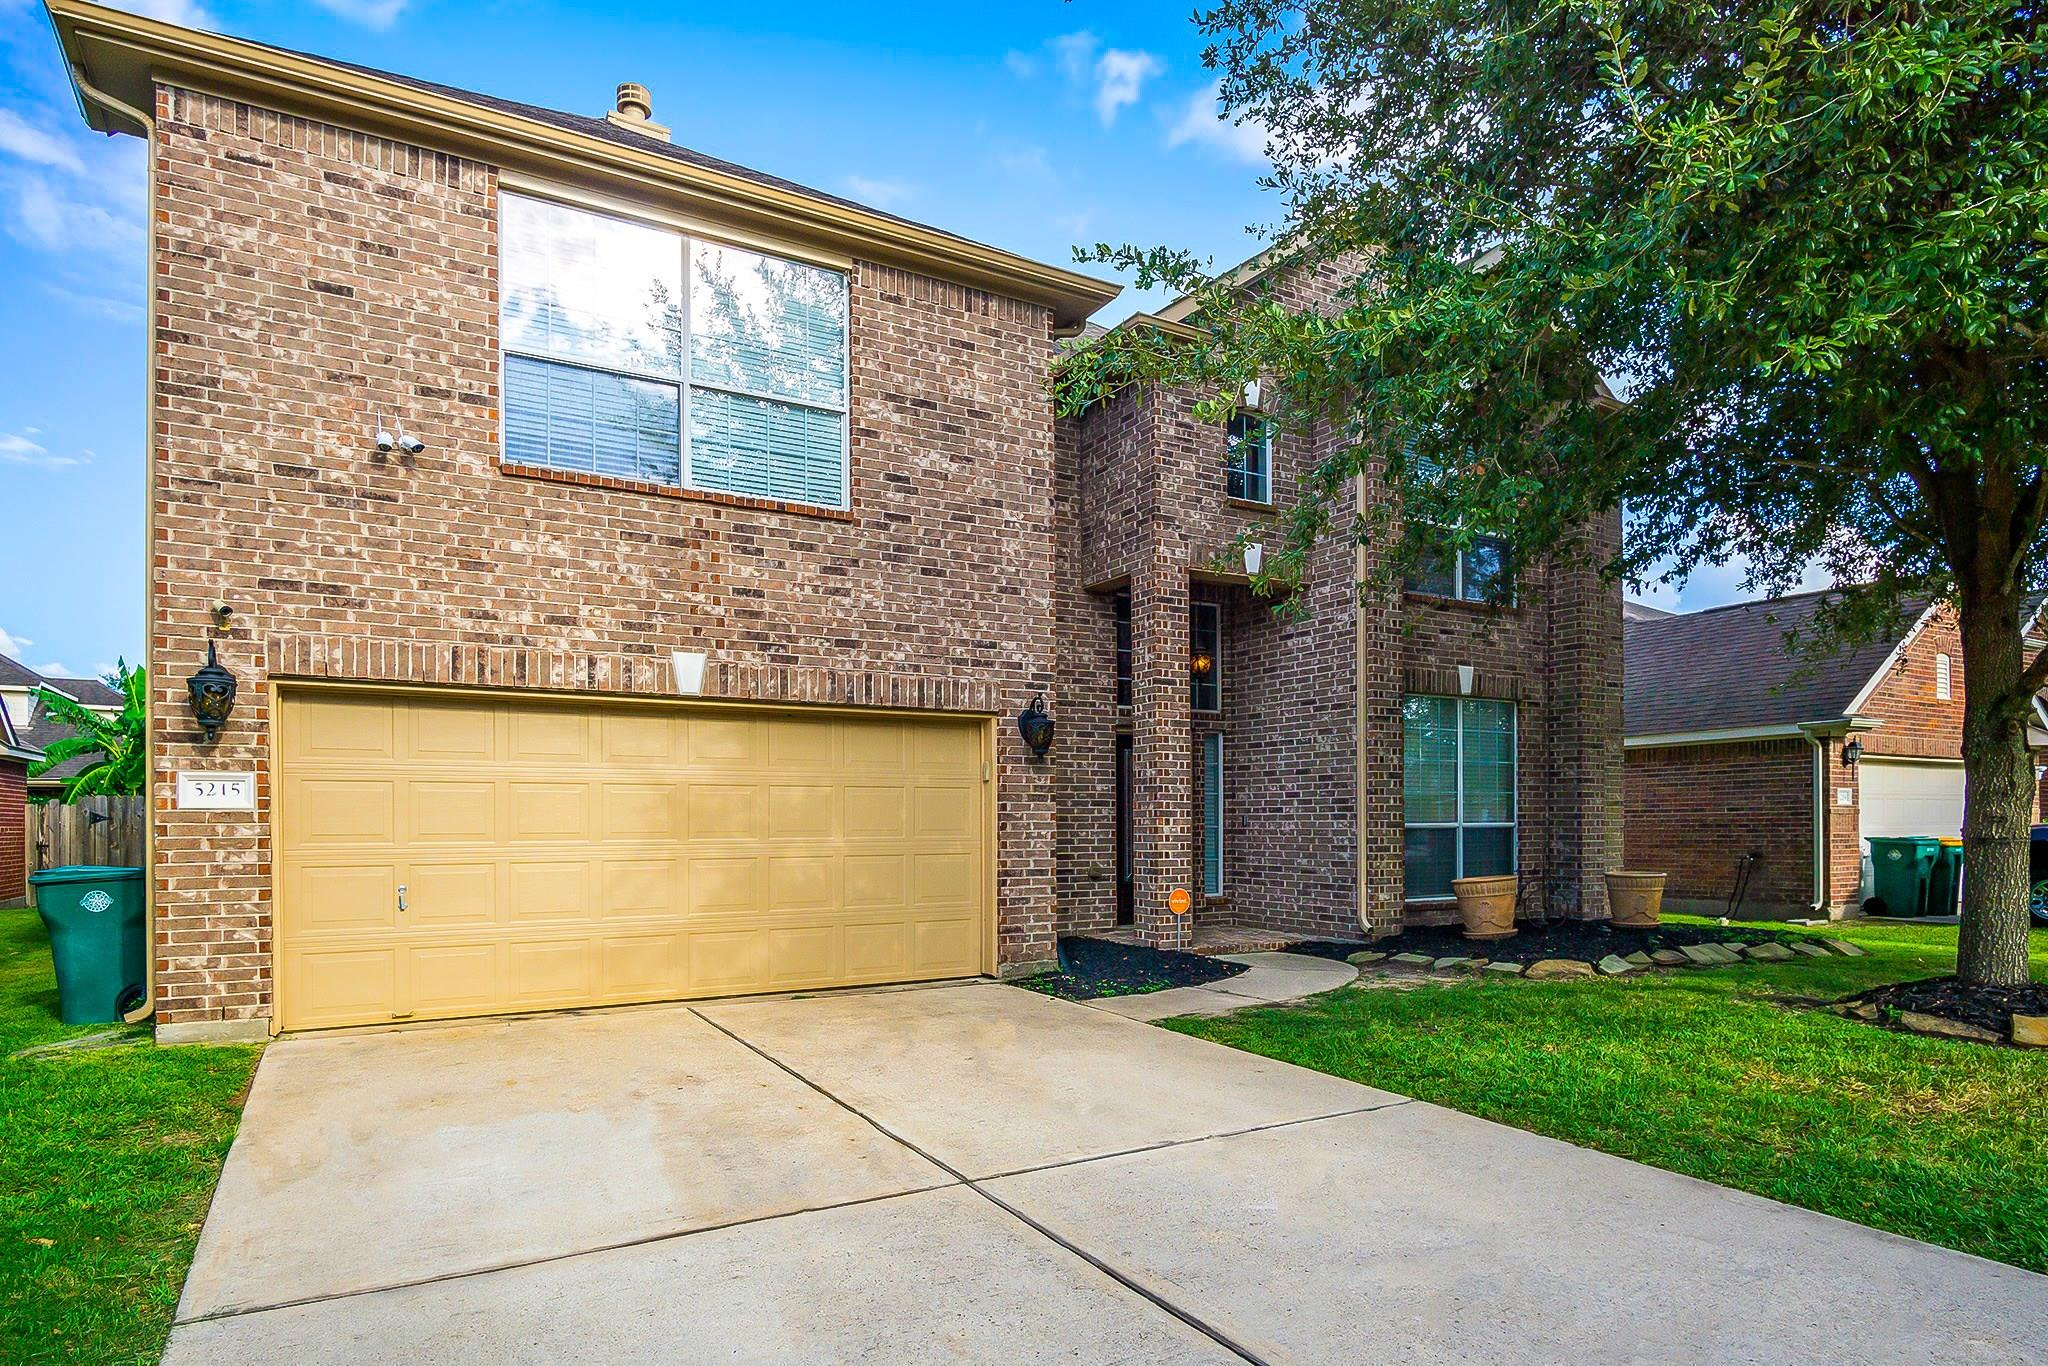 5215 Laura Lee Lane Property Photo - Pasadena, TX real estate listing